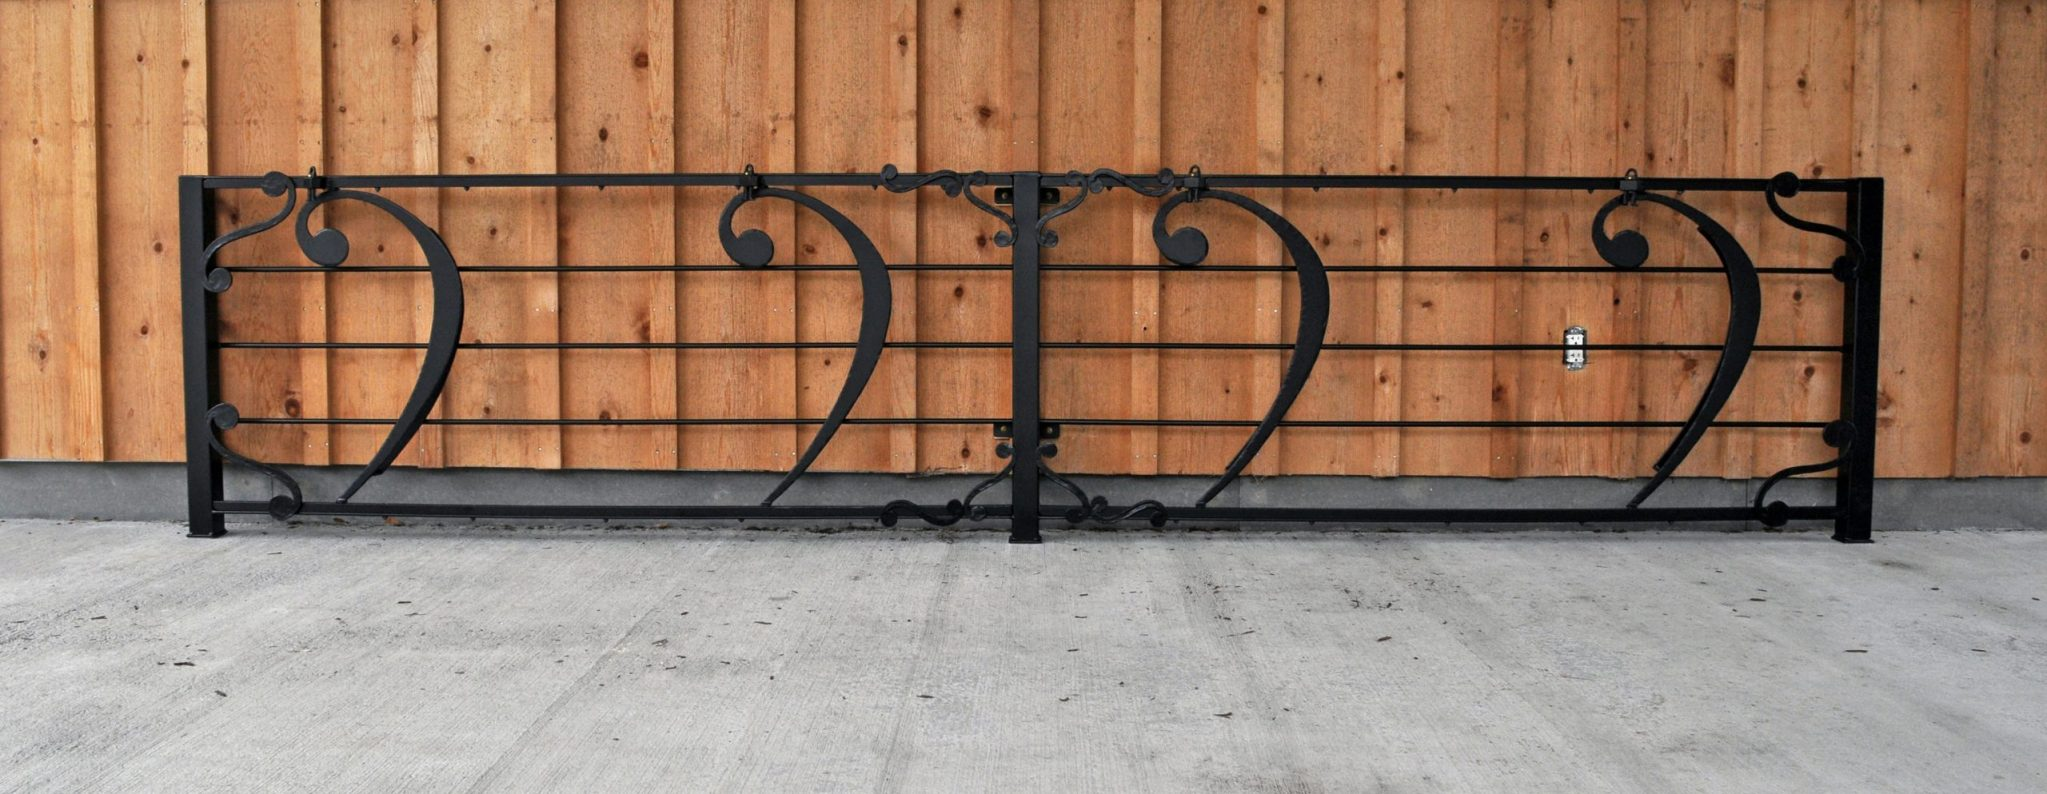 Fabricated Decorative Bike Rack